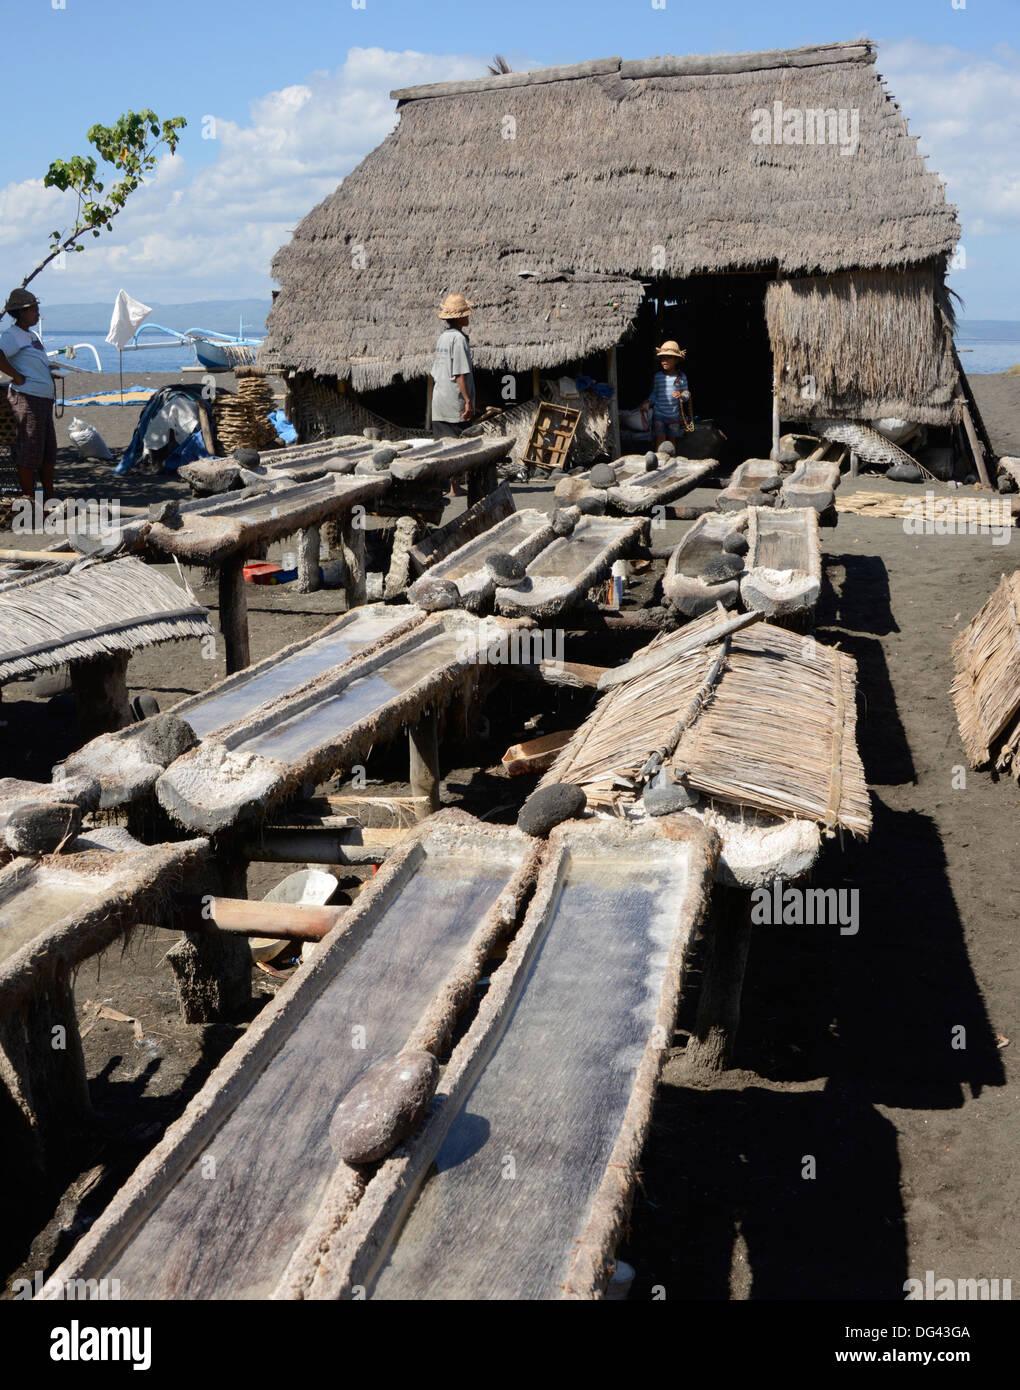 Marine Salzproduktion, Kusamba, Bali, Indonesien, Südostasien, Asien Stockbild